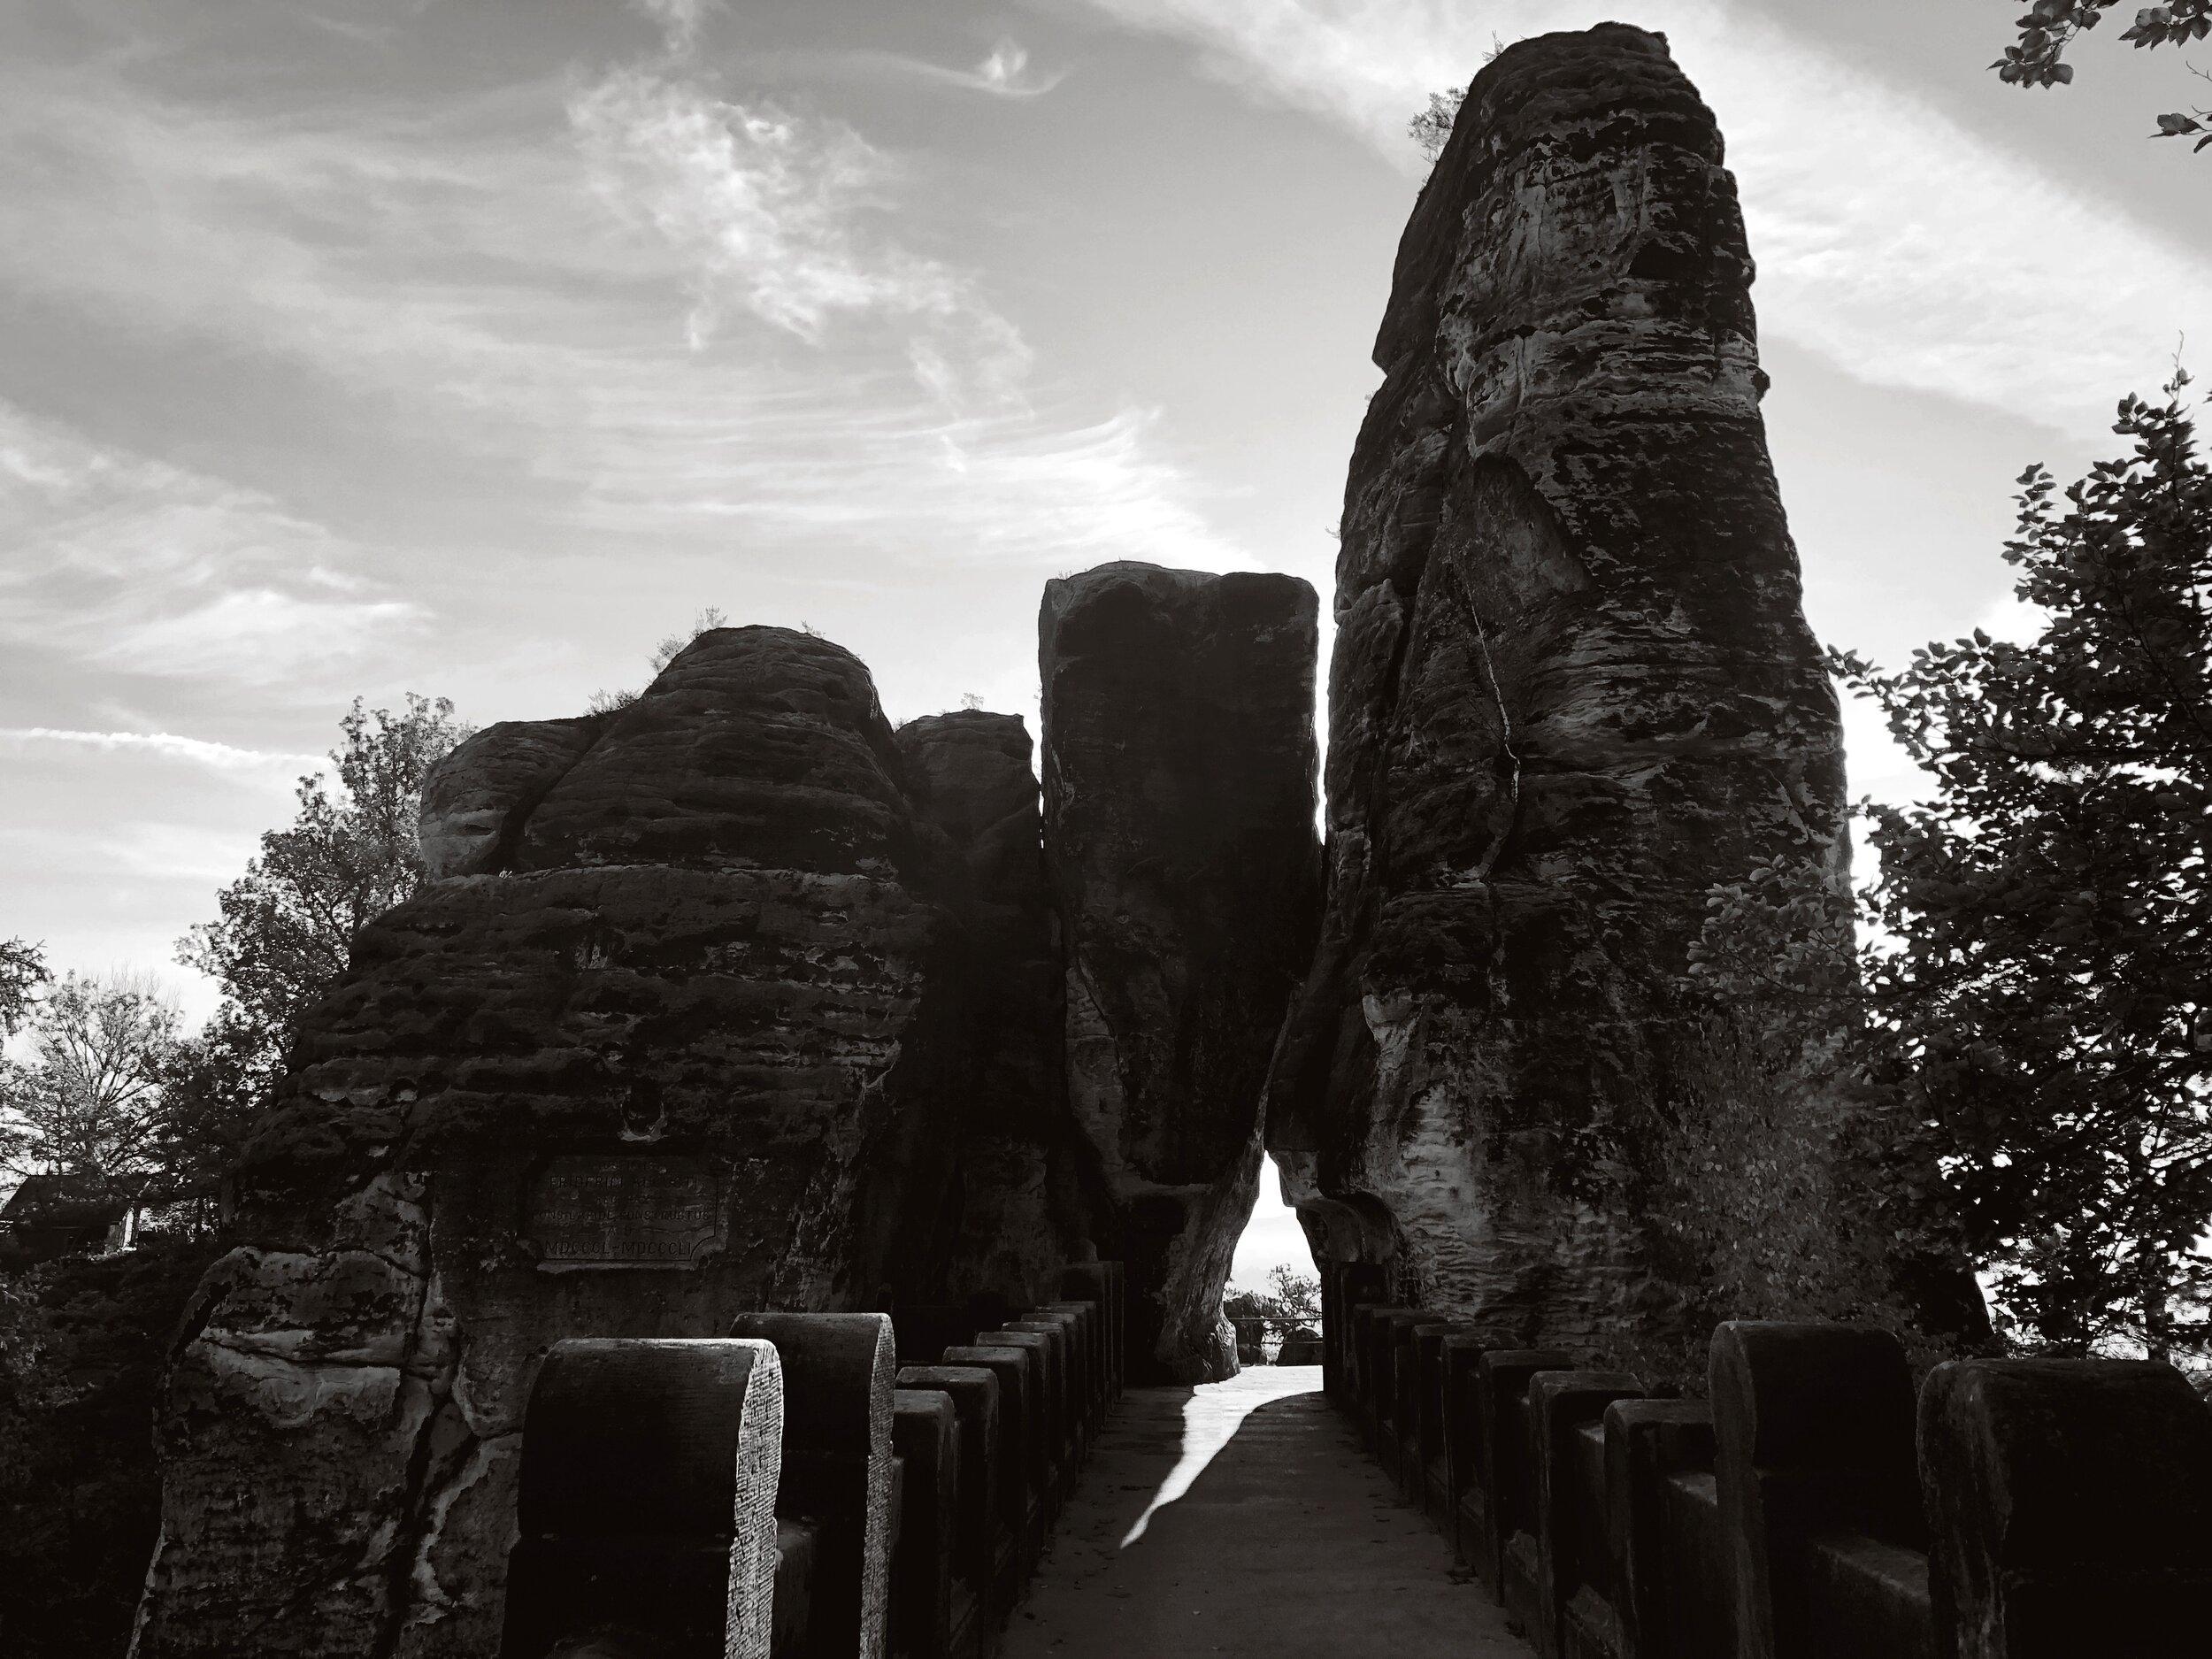 baste-bridge-lohmen-germany-hiking_0341.JPG